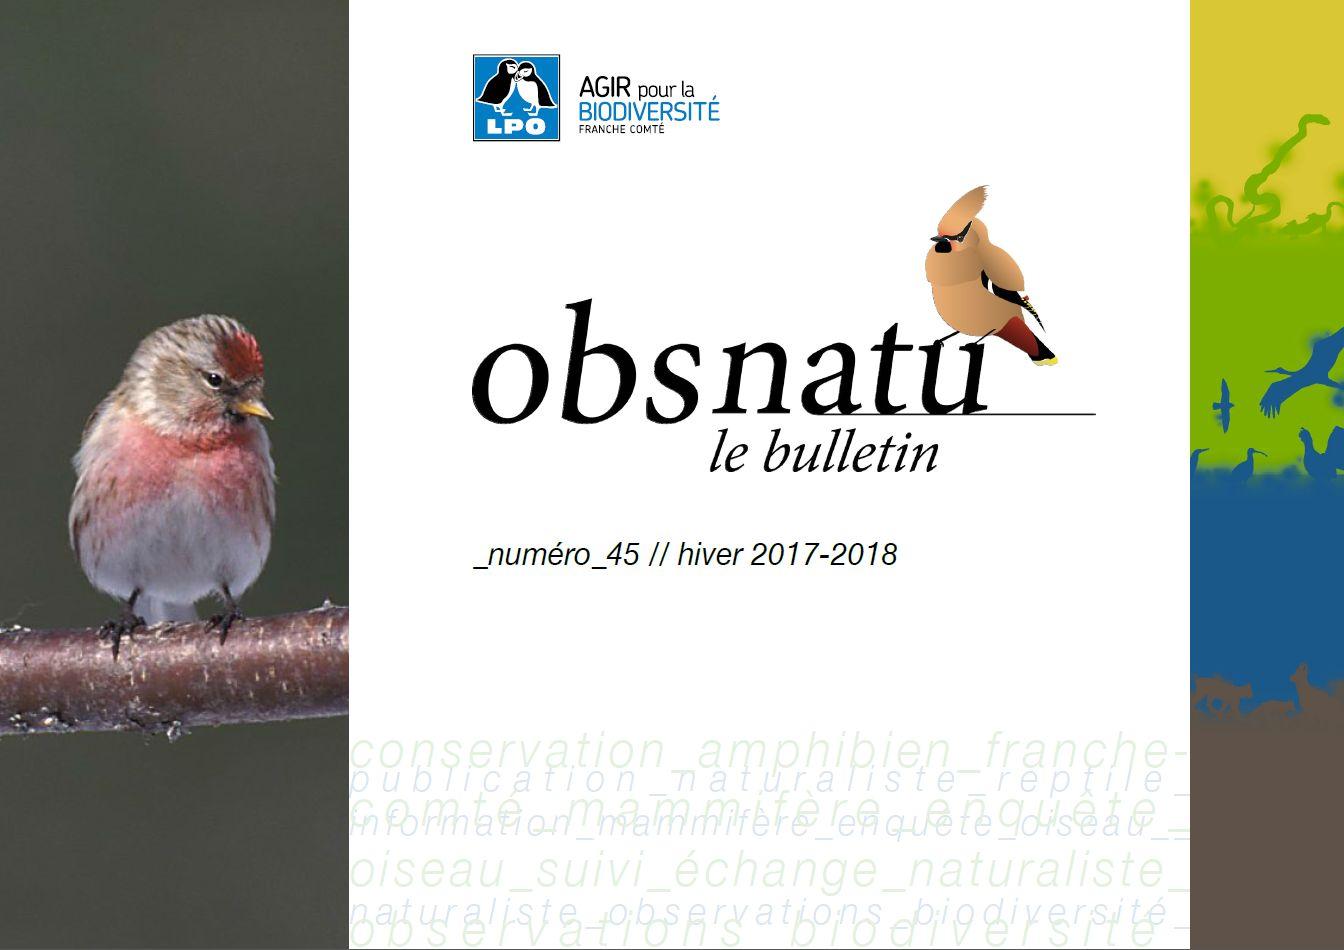 http://files.biolovision.net/franche-comte.lpo.fr/userfiles/publications/Obsnatubulls/Obsnatun45hiver2017-2018couv.jpg